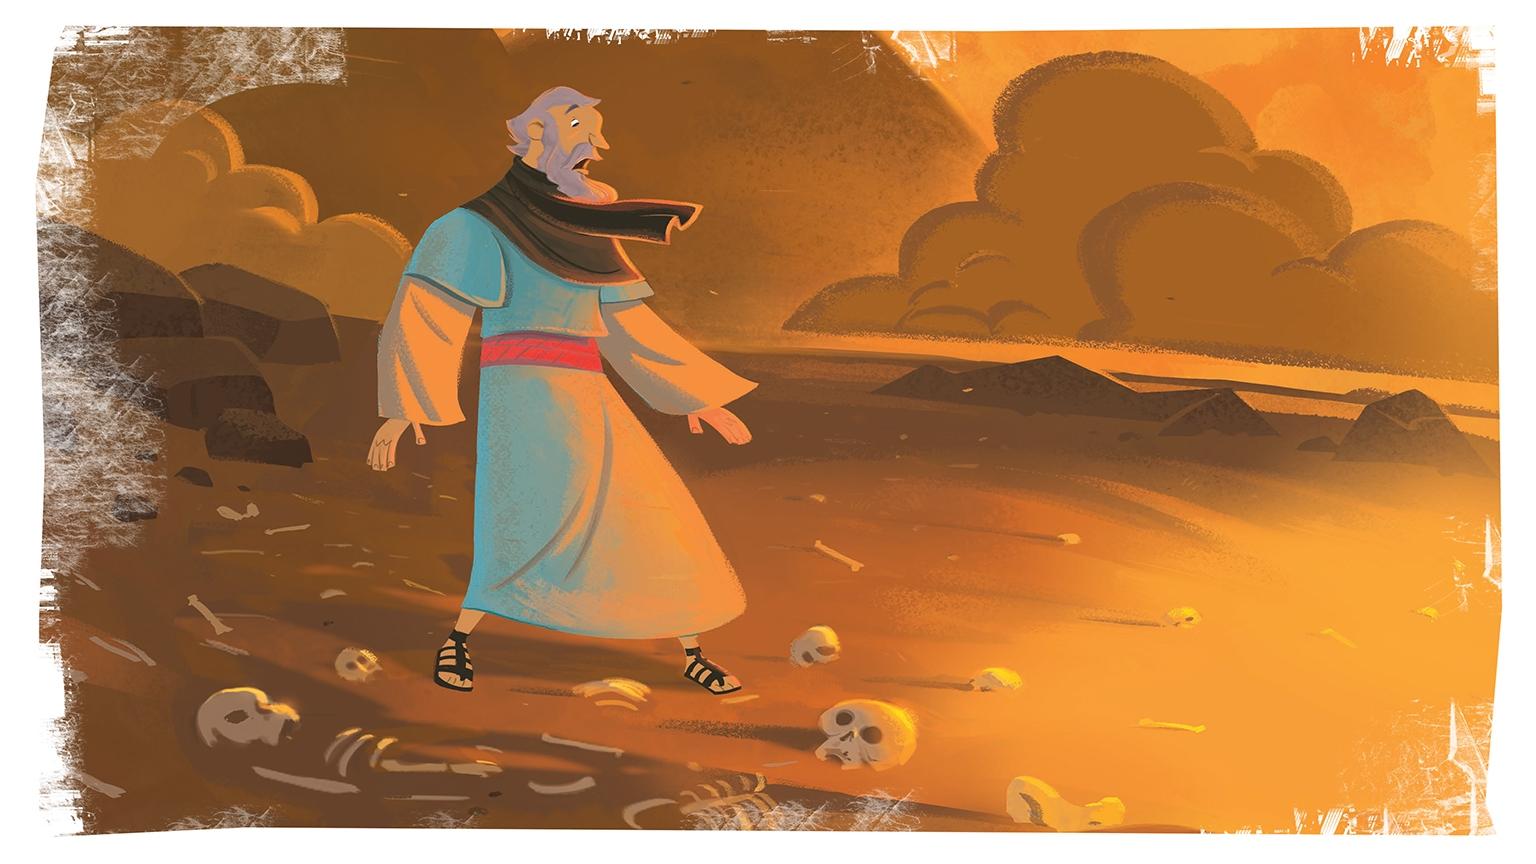 Ezekiel Brings Hope